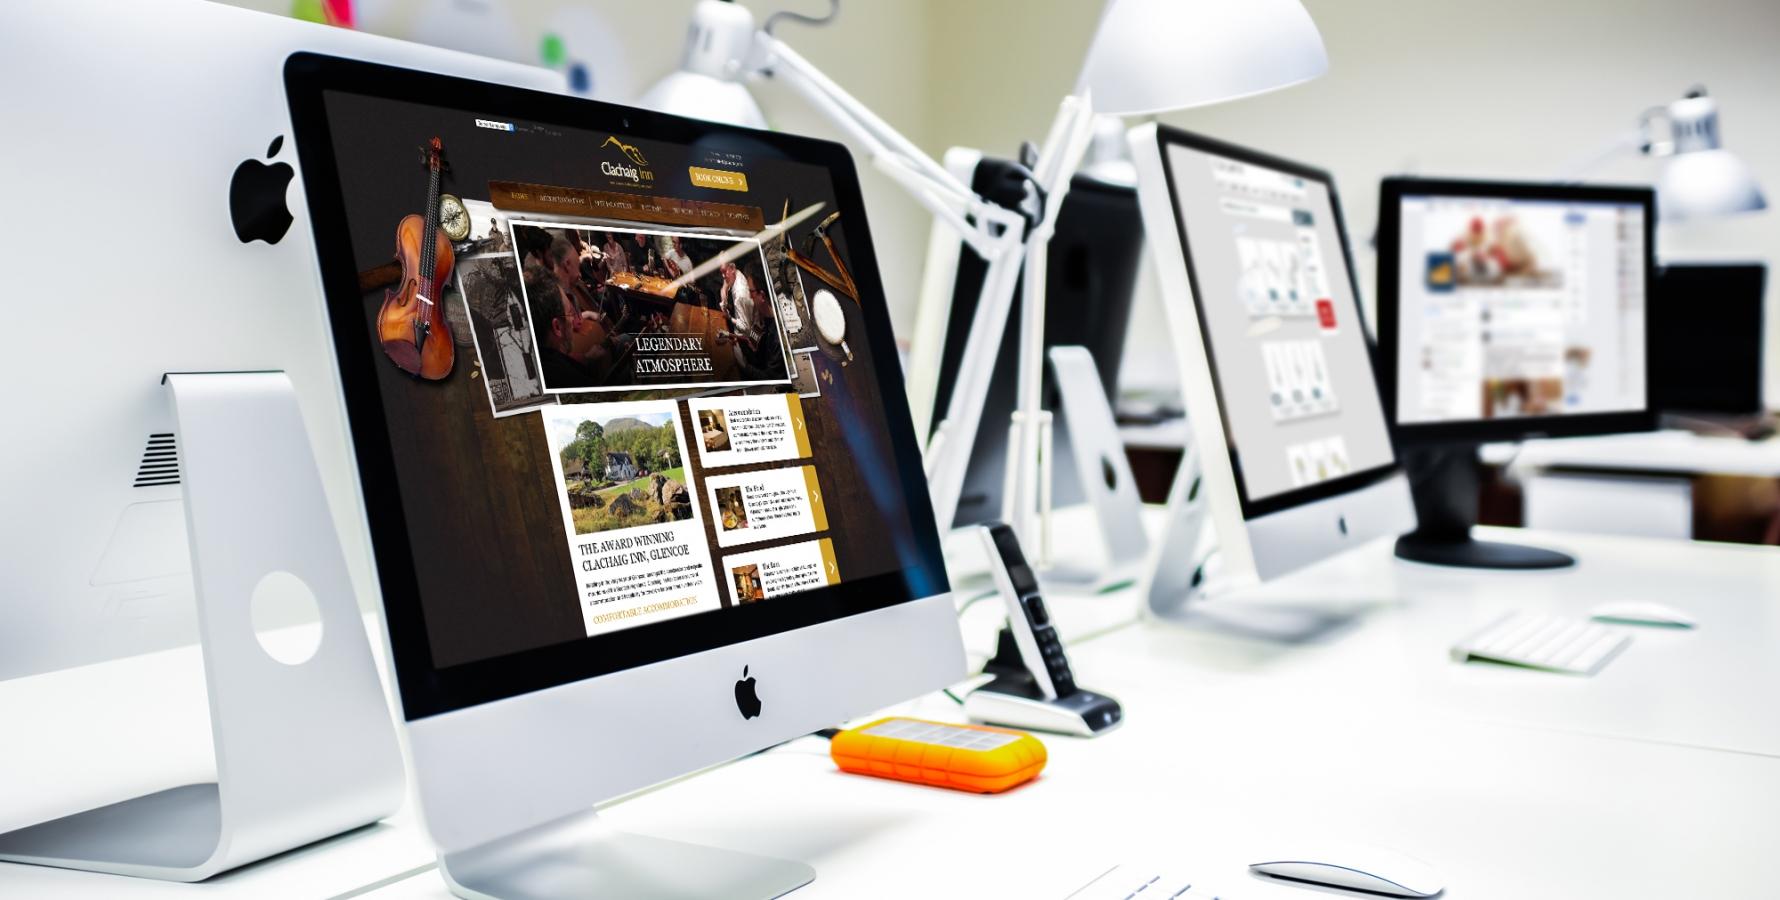 Studio - lamontdesign Design & Marketing Agency - Edinburgh, Aberdeen, Fort William, Scotland